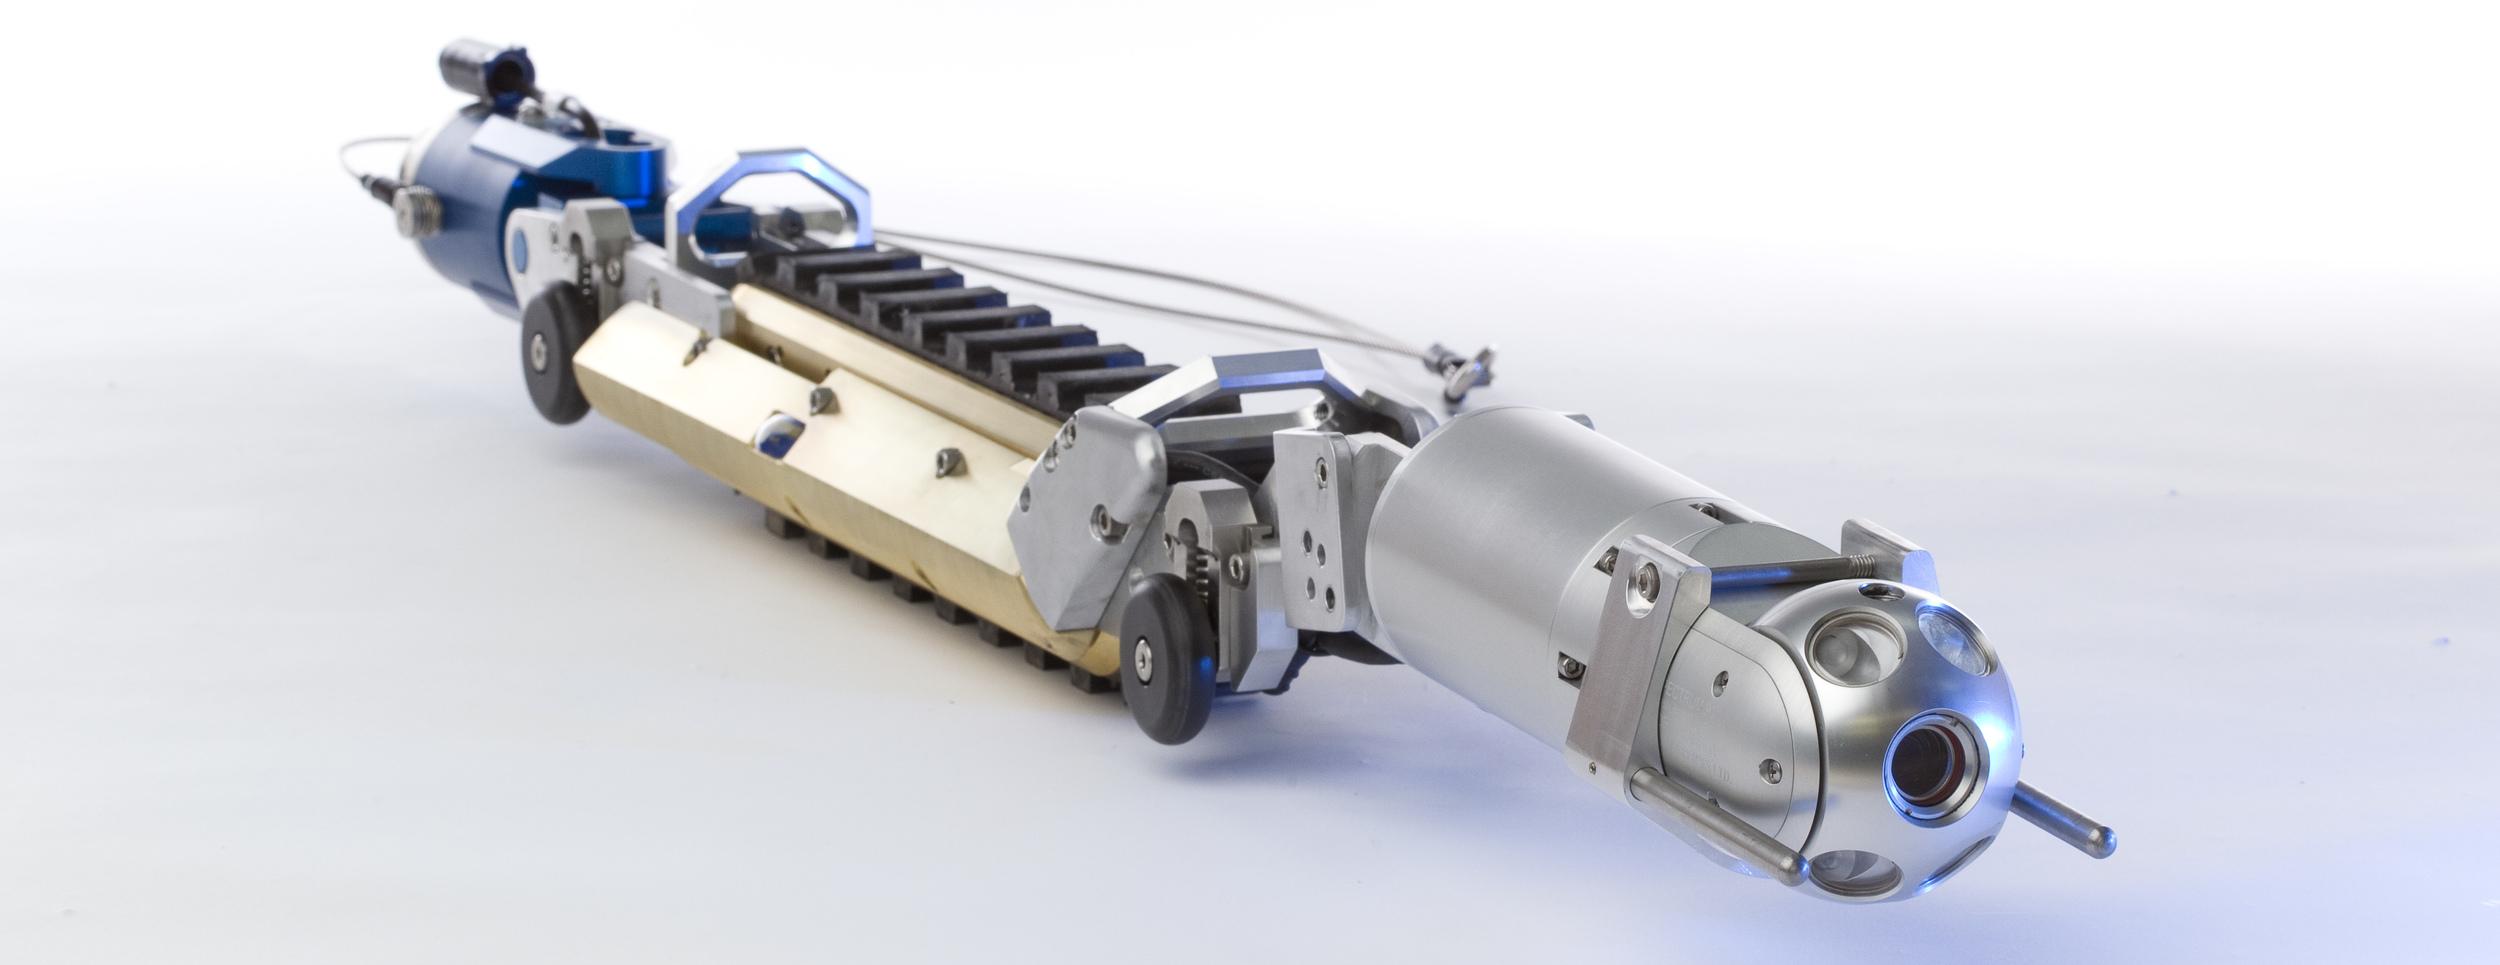 Versatrax 150, VT150, Inline Configuration Pipe Inspection Crawler